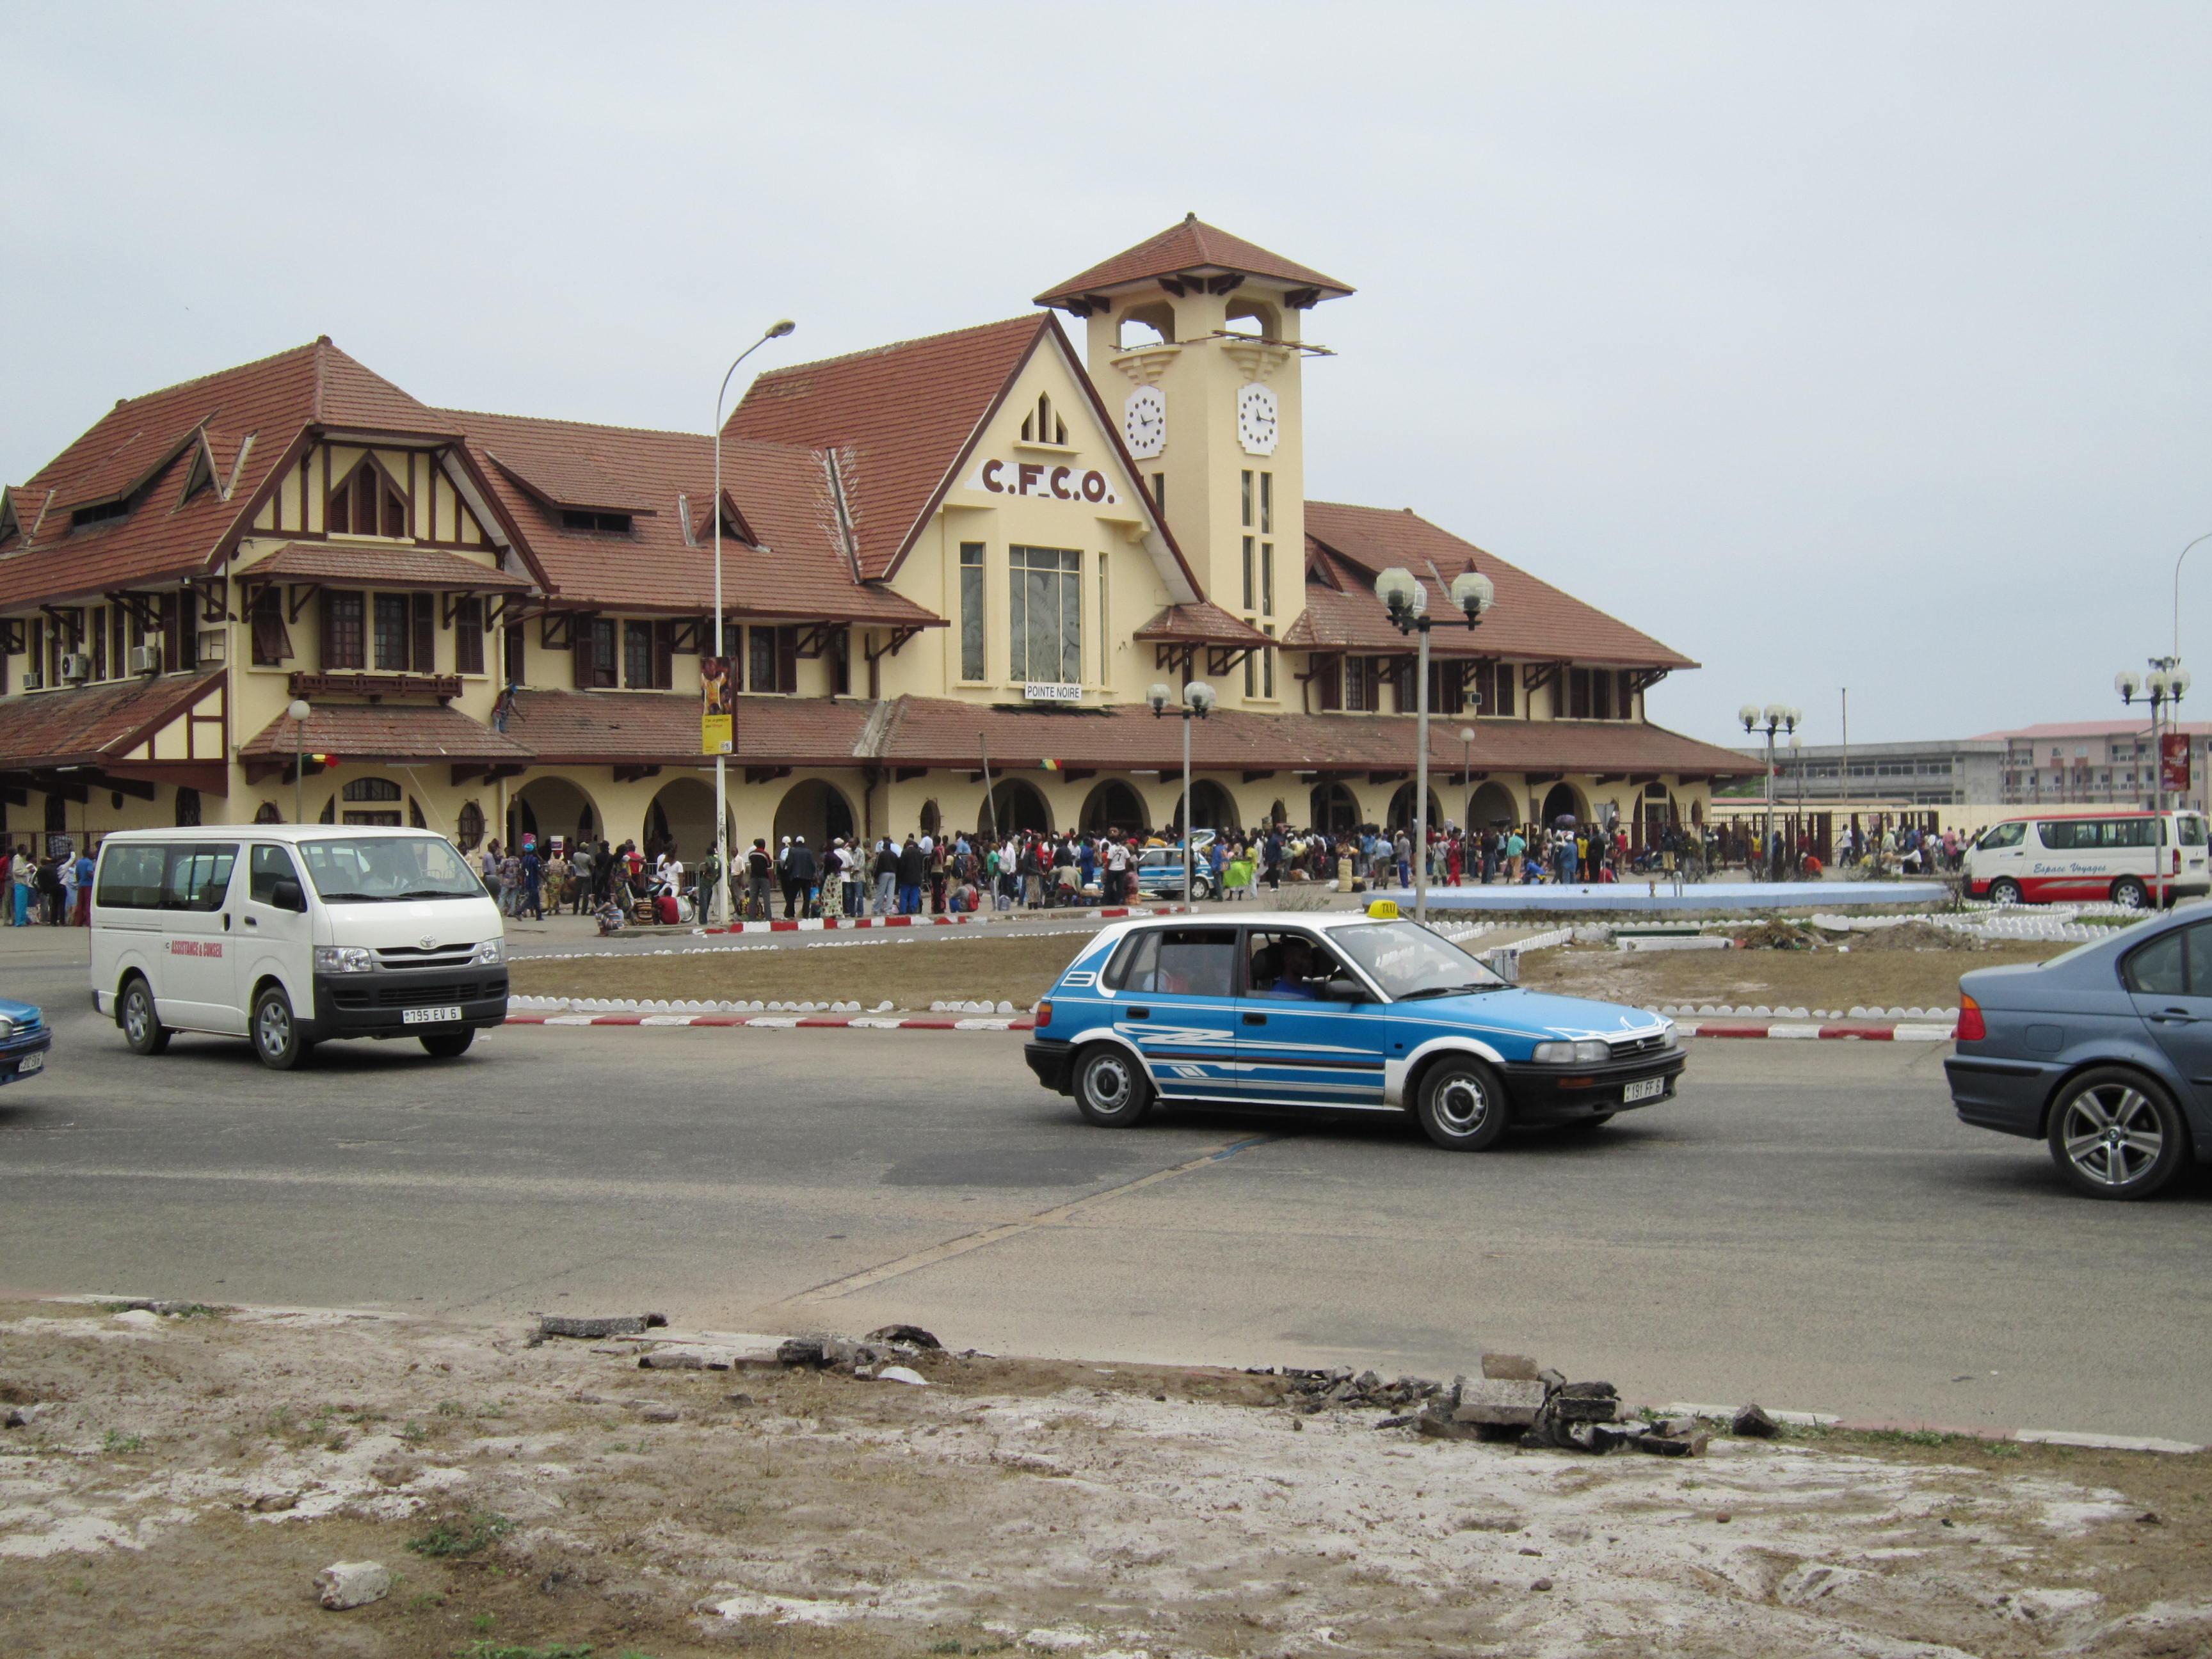 Le Congo-Brazzaville : Un pays au bord de la faillite [Vidéo]